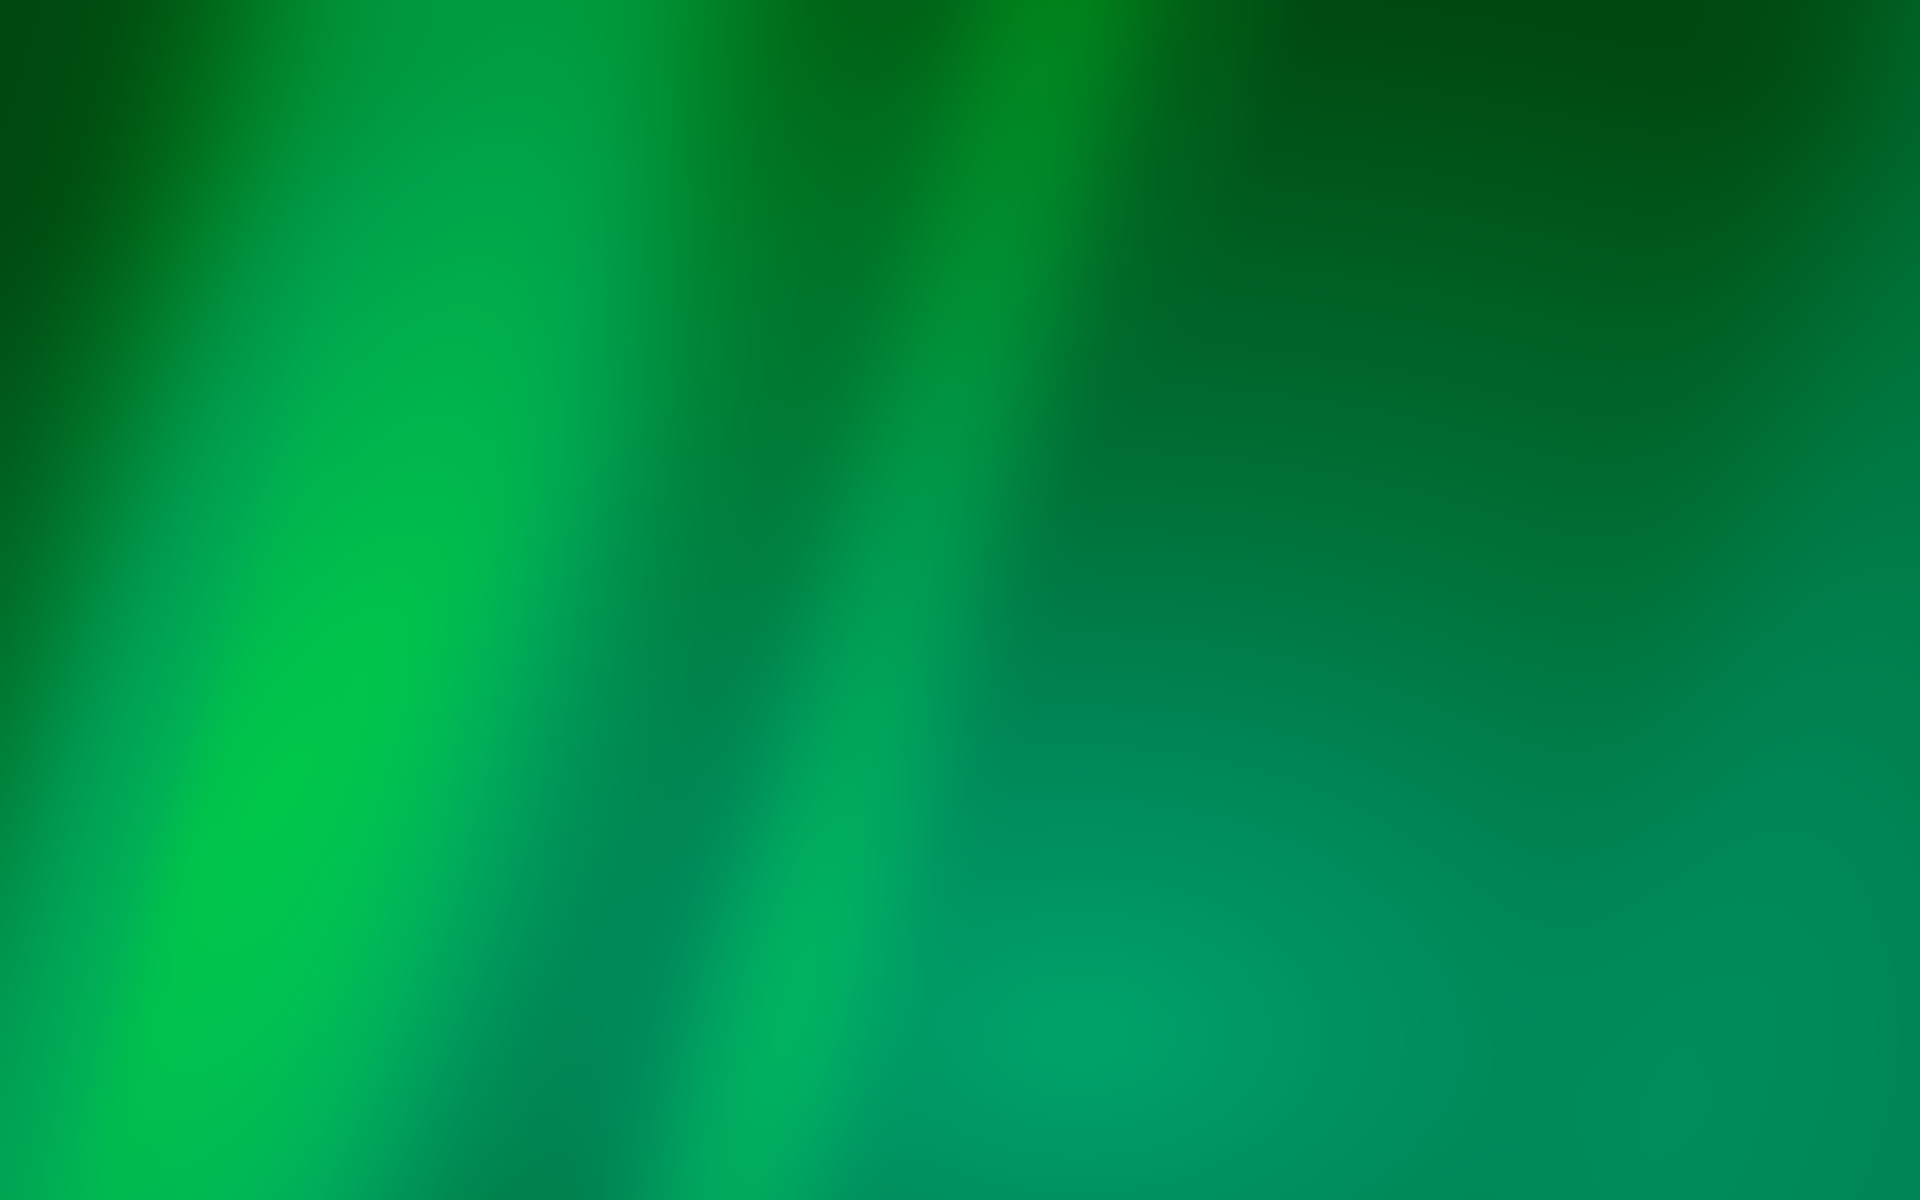 Metallic Green Wallpaper Green Wallpaper Green Gradient Background Green Floral Wallpaper